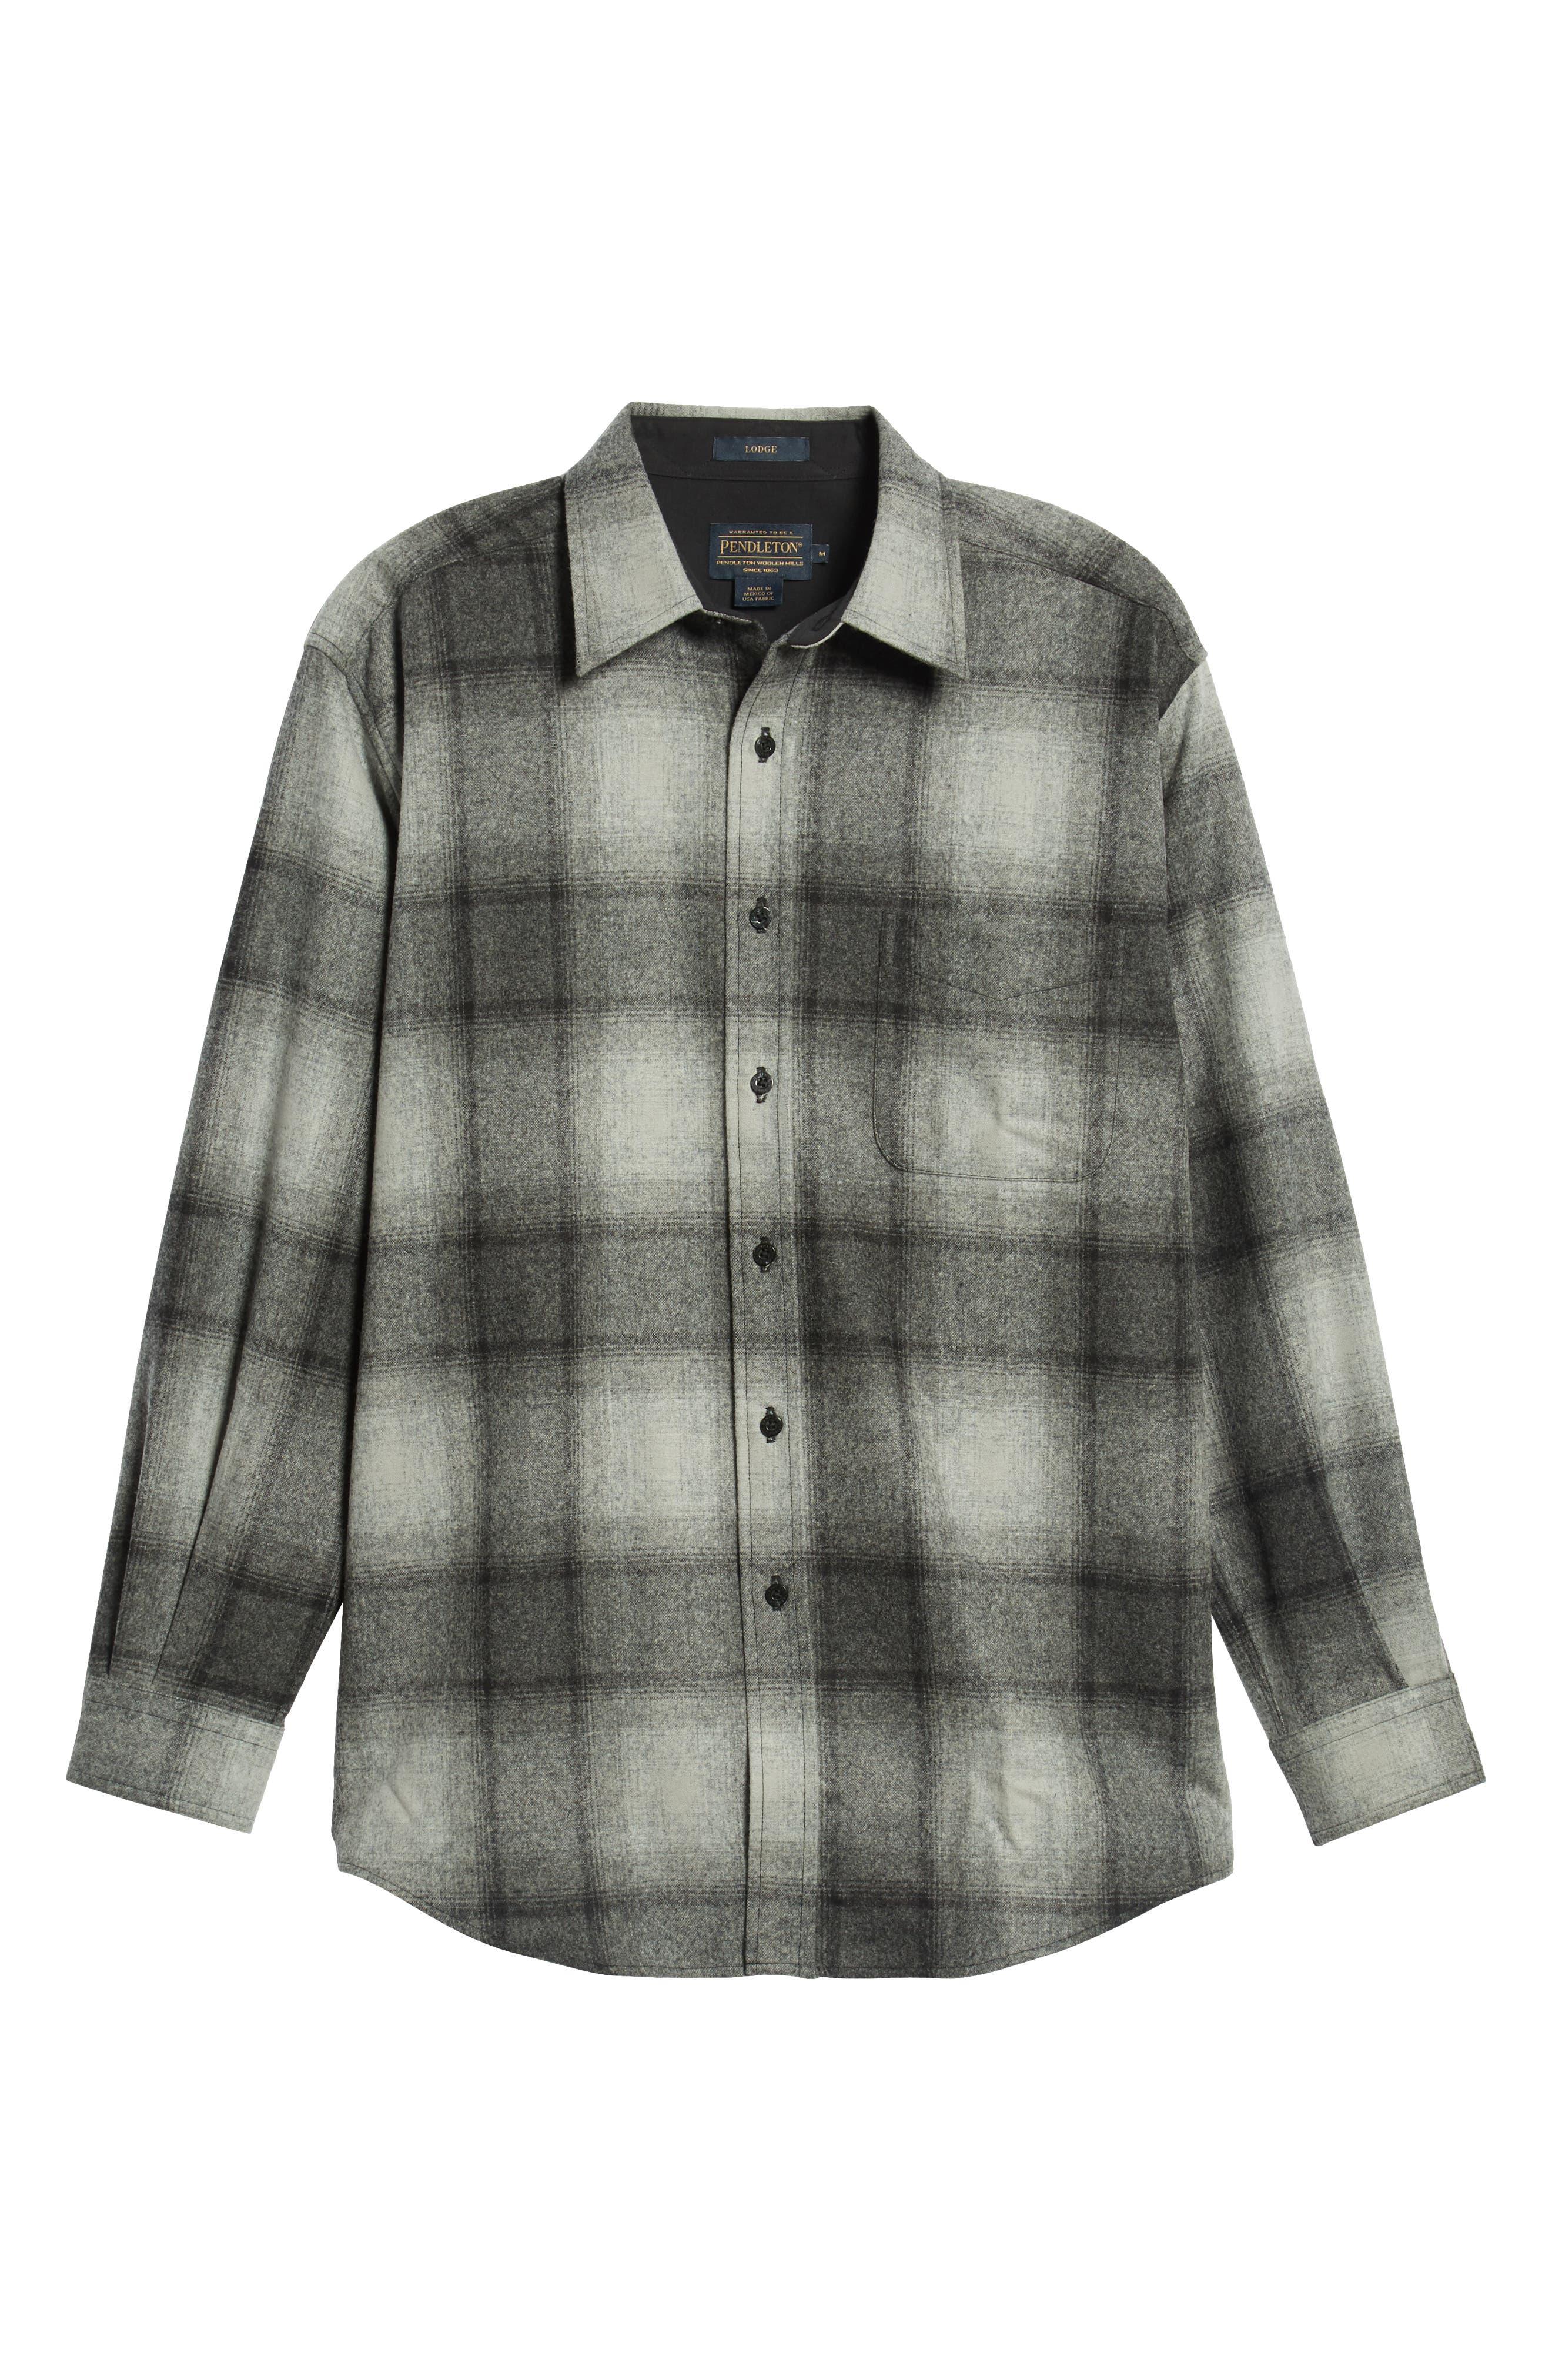 PENDLETON,                             Lodge Wool Flannel Shirt,                             Alternate thumbnail 5, color,                             020